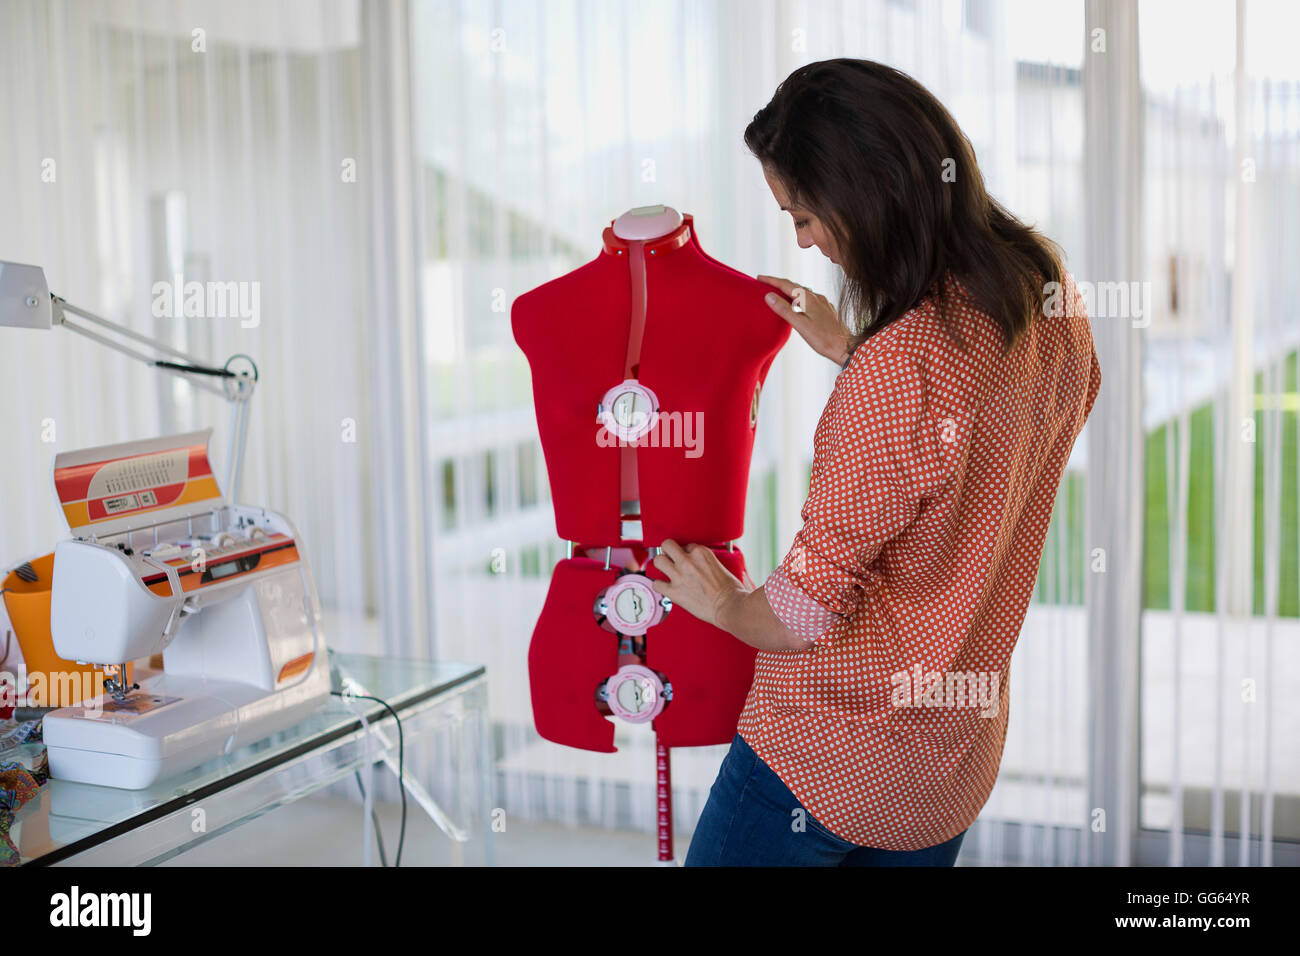 Dressmakers Mannequin Stock Photos Amp Dressmakers Mannequin